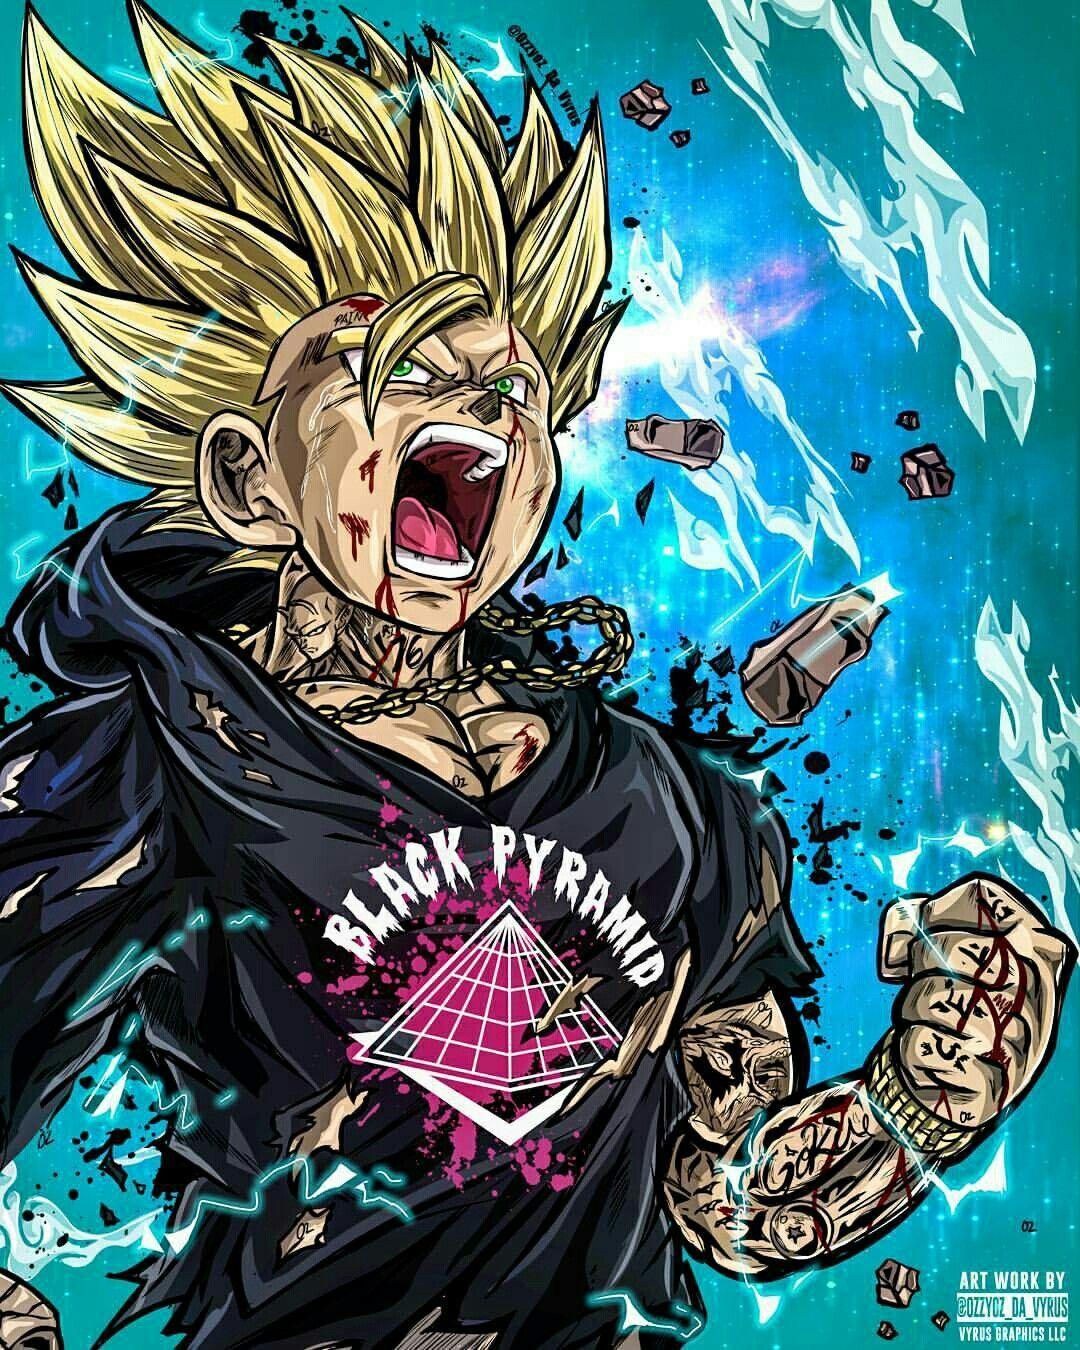 Gucci Dbz Dragon Ball Gt Personagens De Anime Desenhos Dragonball